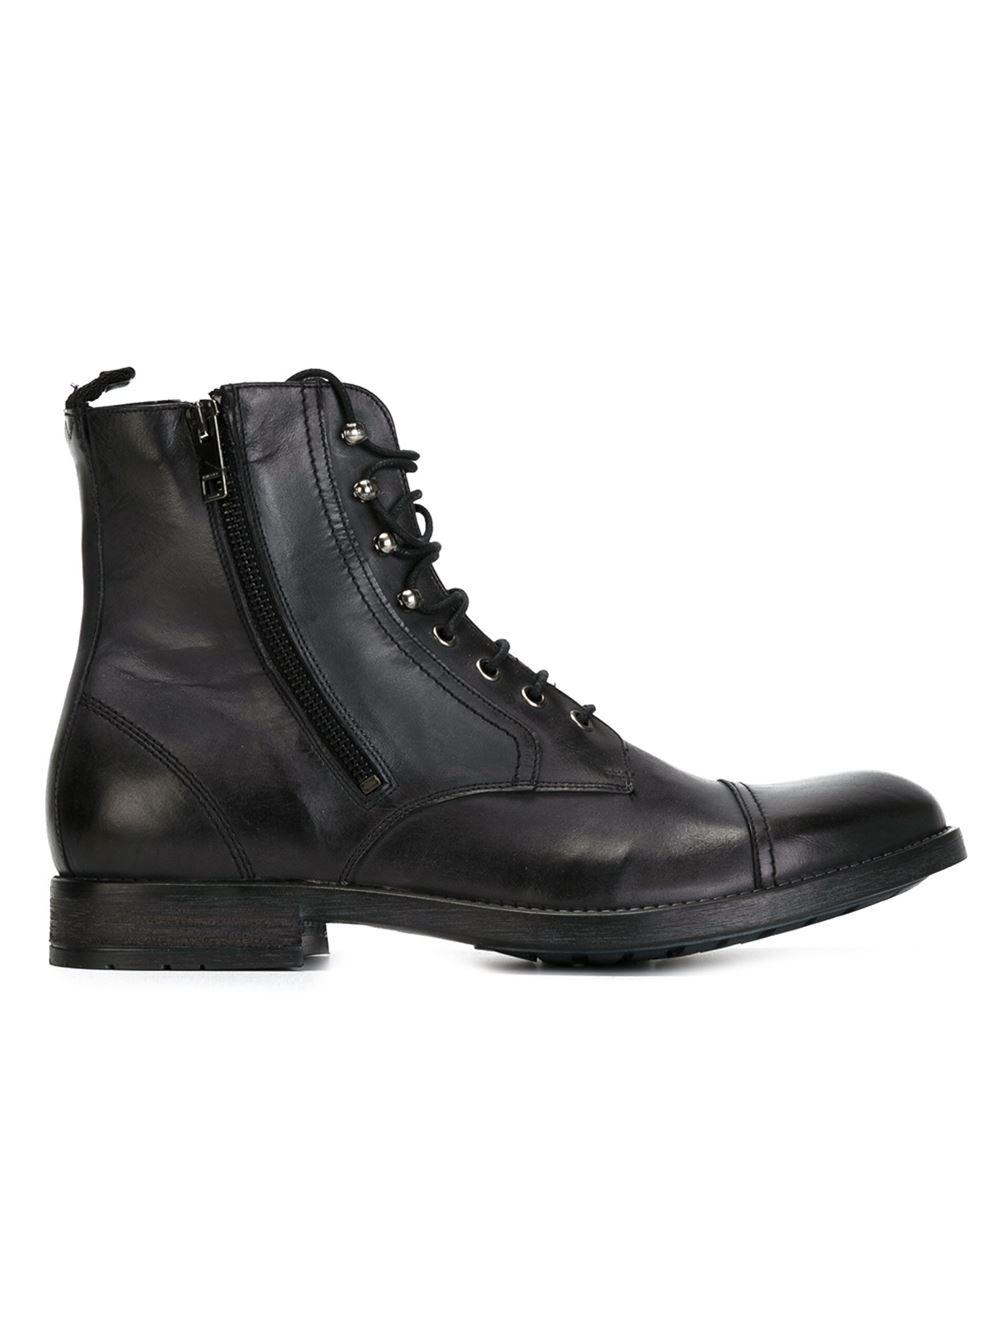 Diesel 'd-kallien' Ankle Boots in Black for Men | Lyst